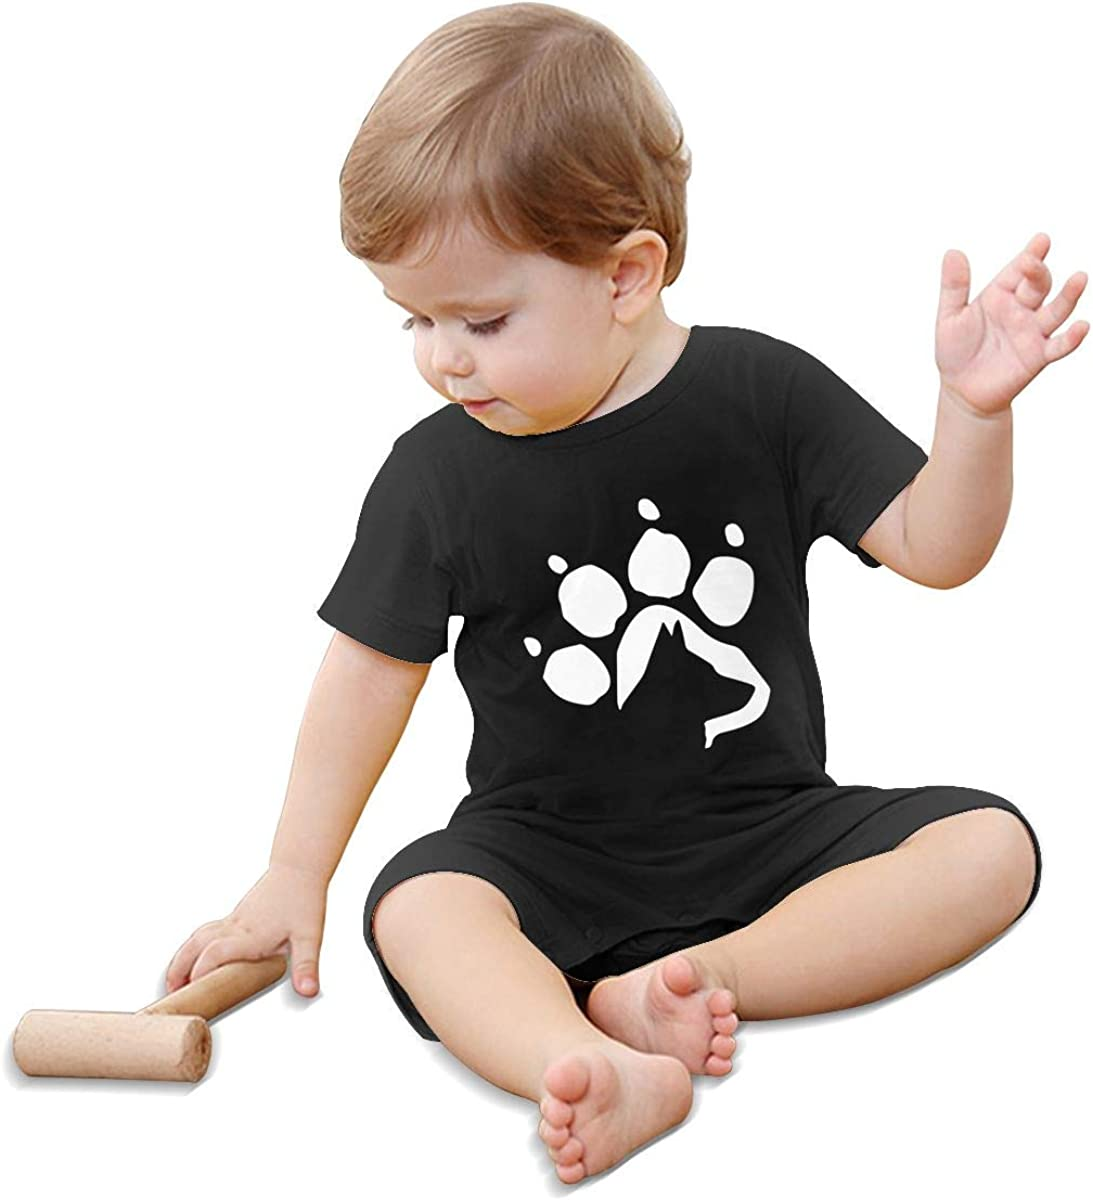 Newborn Kids Coverall German Shepherd Dog Paw-1 Infant Short Sleeve Romper Jumpsuit